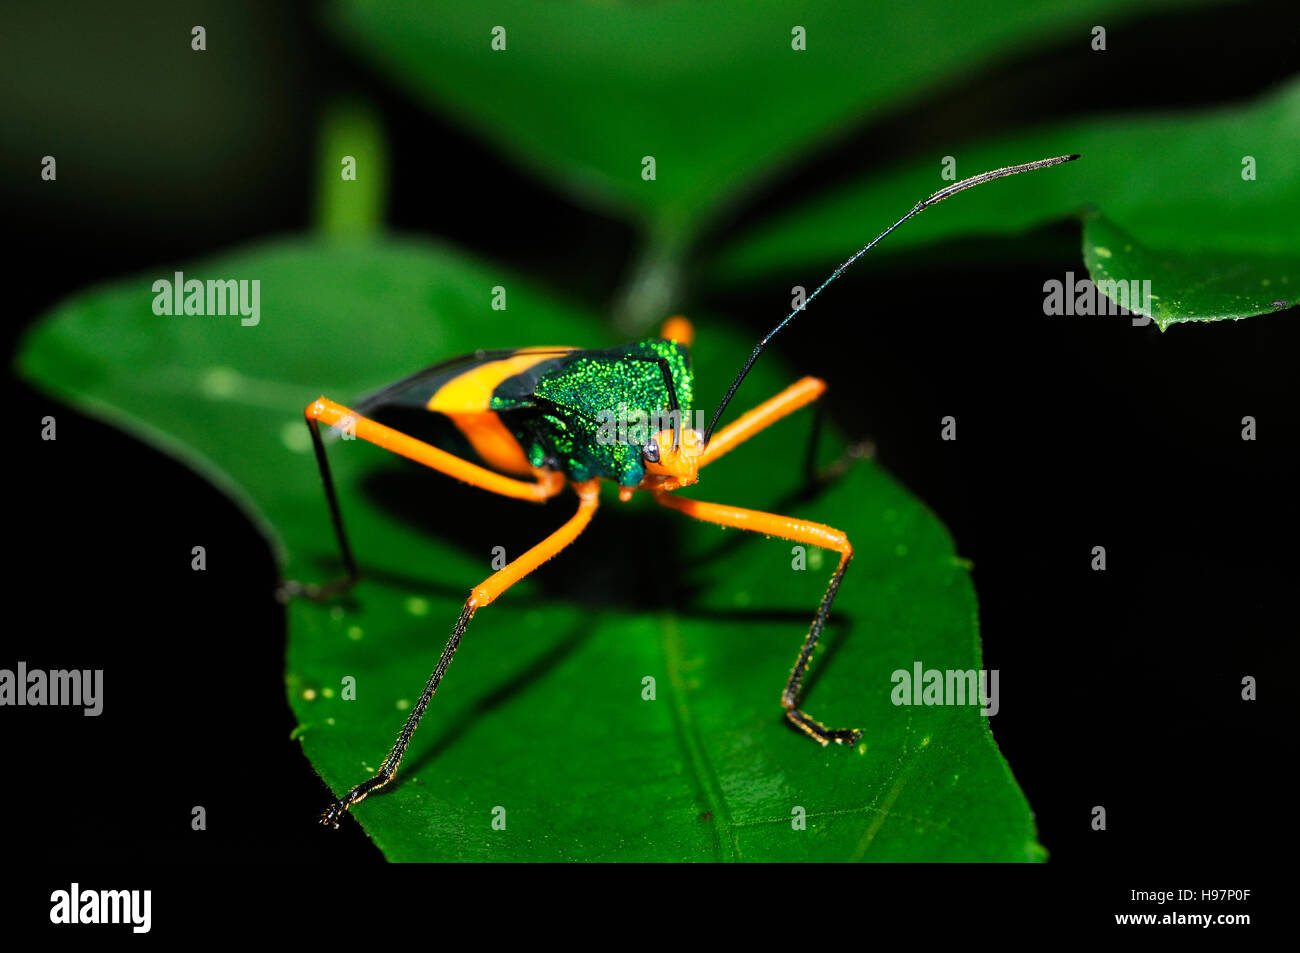 Beautiful beetle on leaf in the tropical rainforest of Panama, Rainforest, Gamboa, Panama - Stock Image